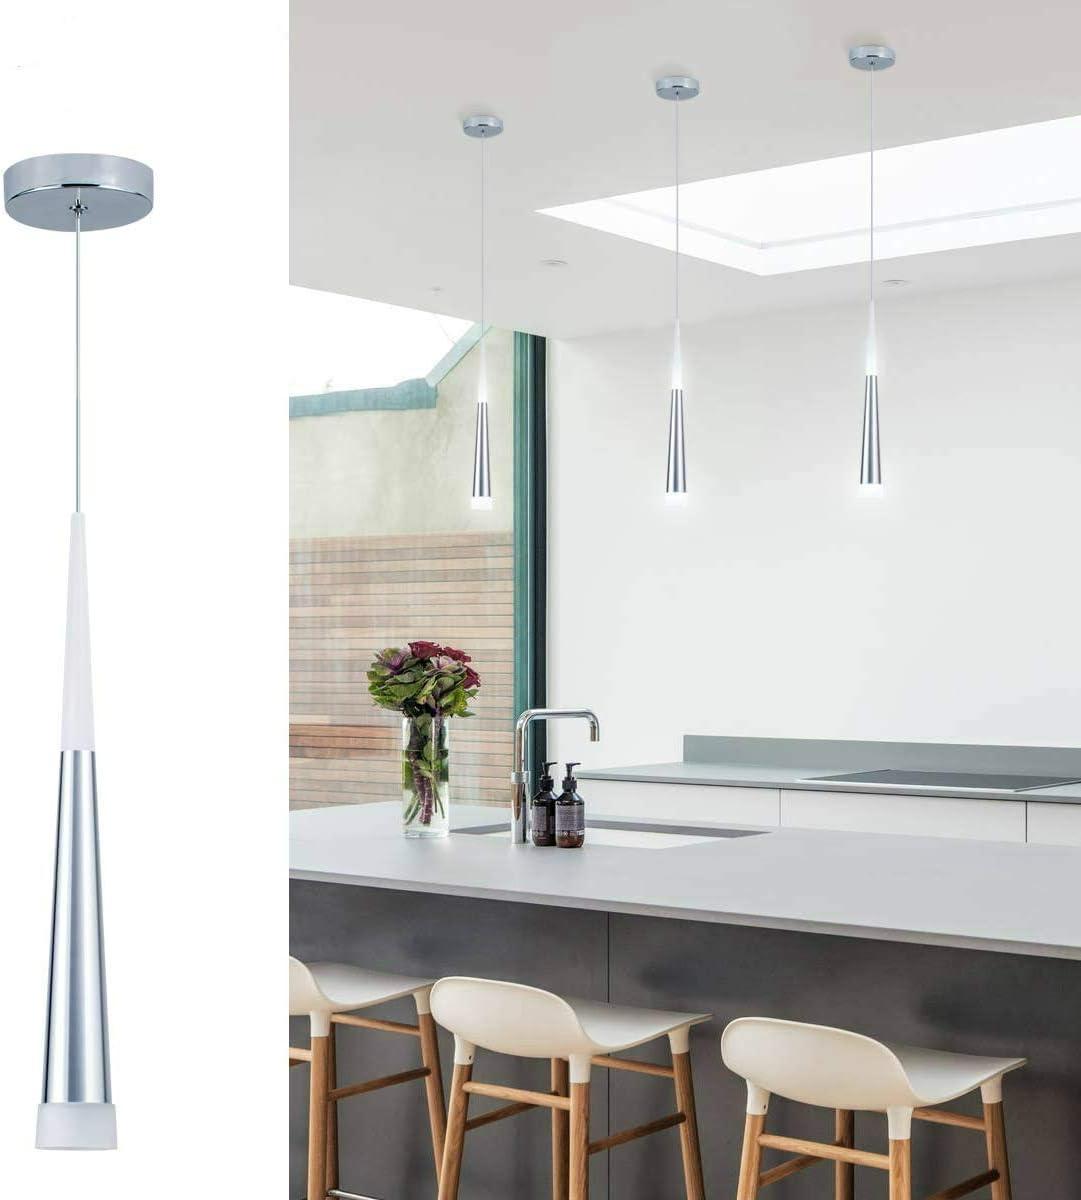 Bewamf Mini Pendant Light Silver Finish With Acrylic Shade Led Cone Adjustable Modern Pendant Lighting For Kitchen Island Dining Room Bar Warm White 3000k 9w 1 Pack Amazon Com